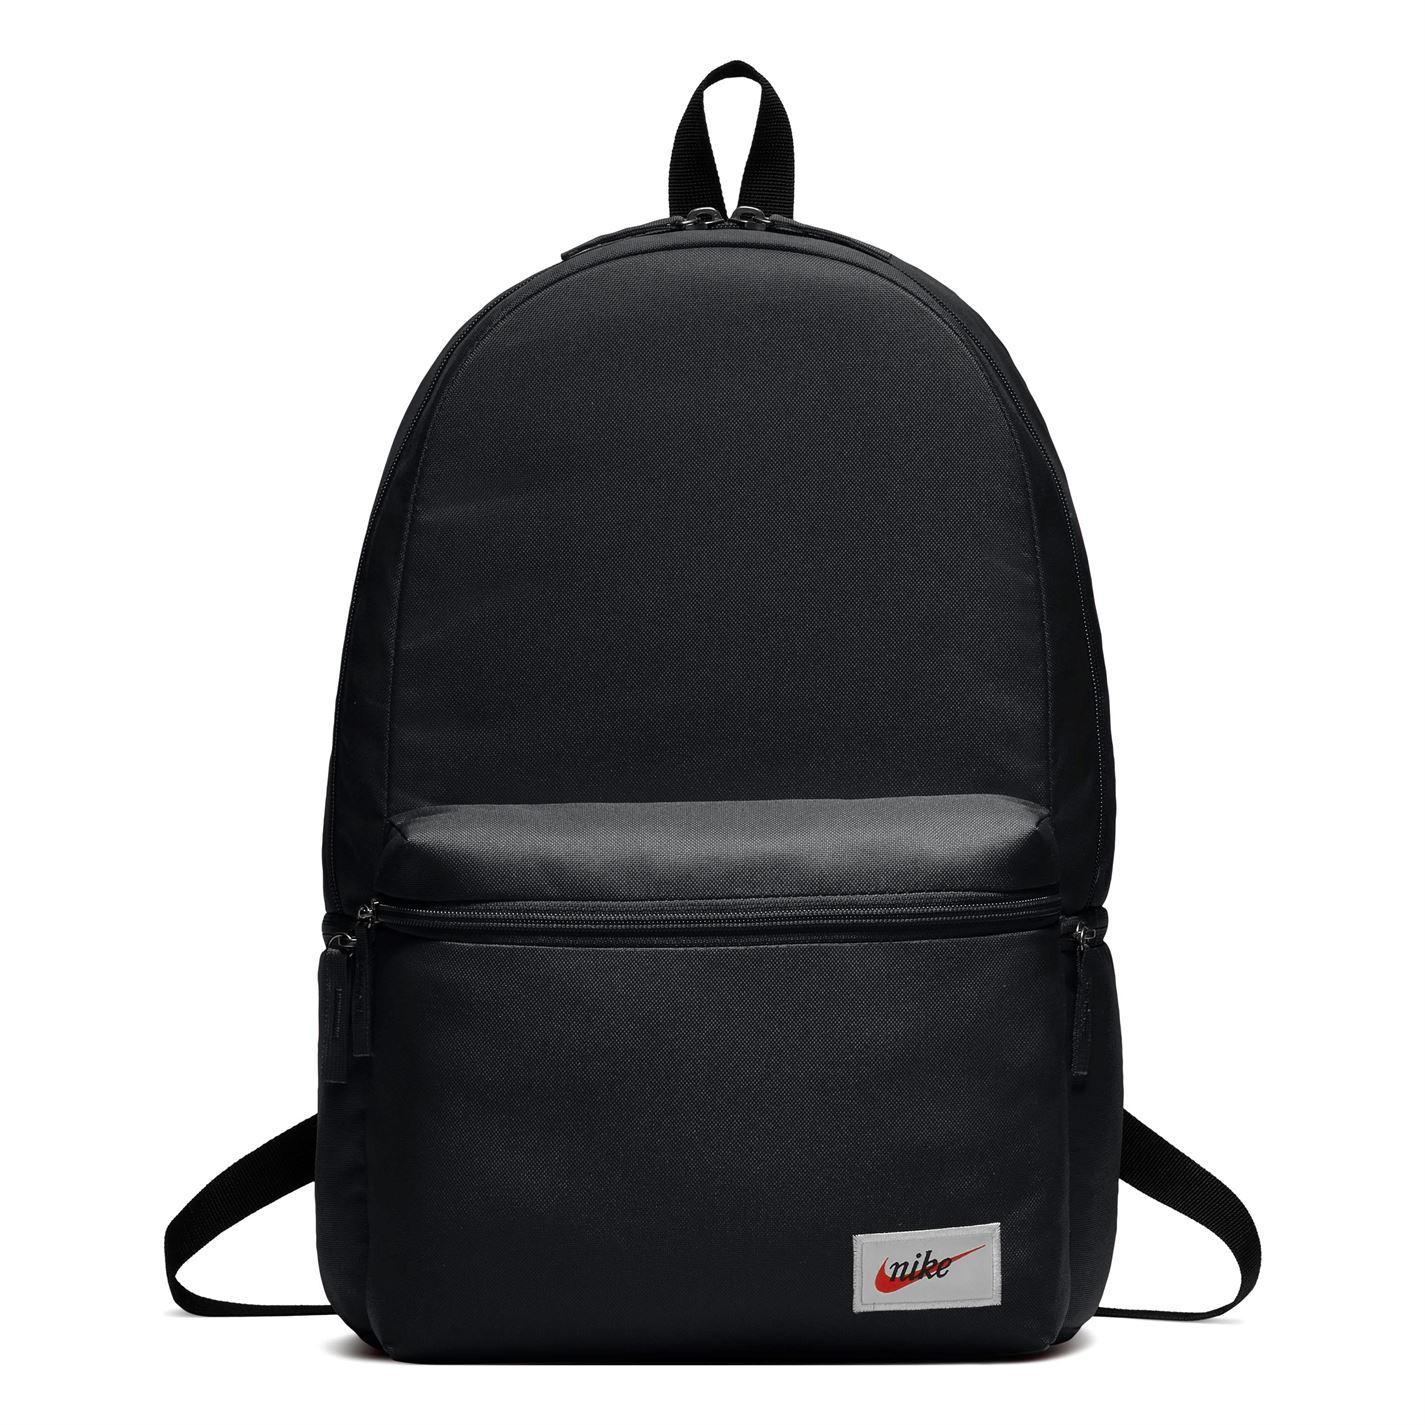 7fd3f5d80d Nike batoh backpack ba4863451 levně